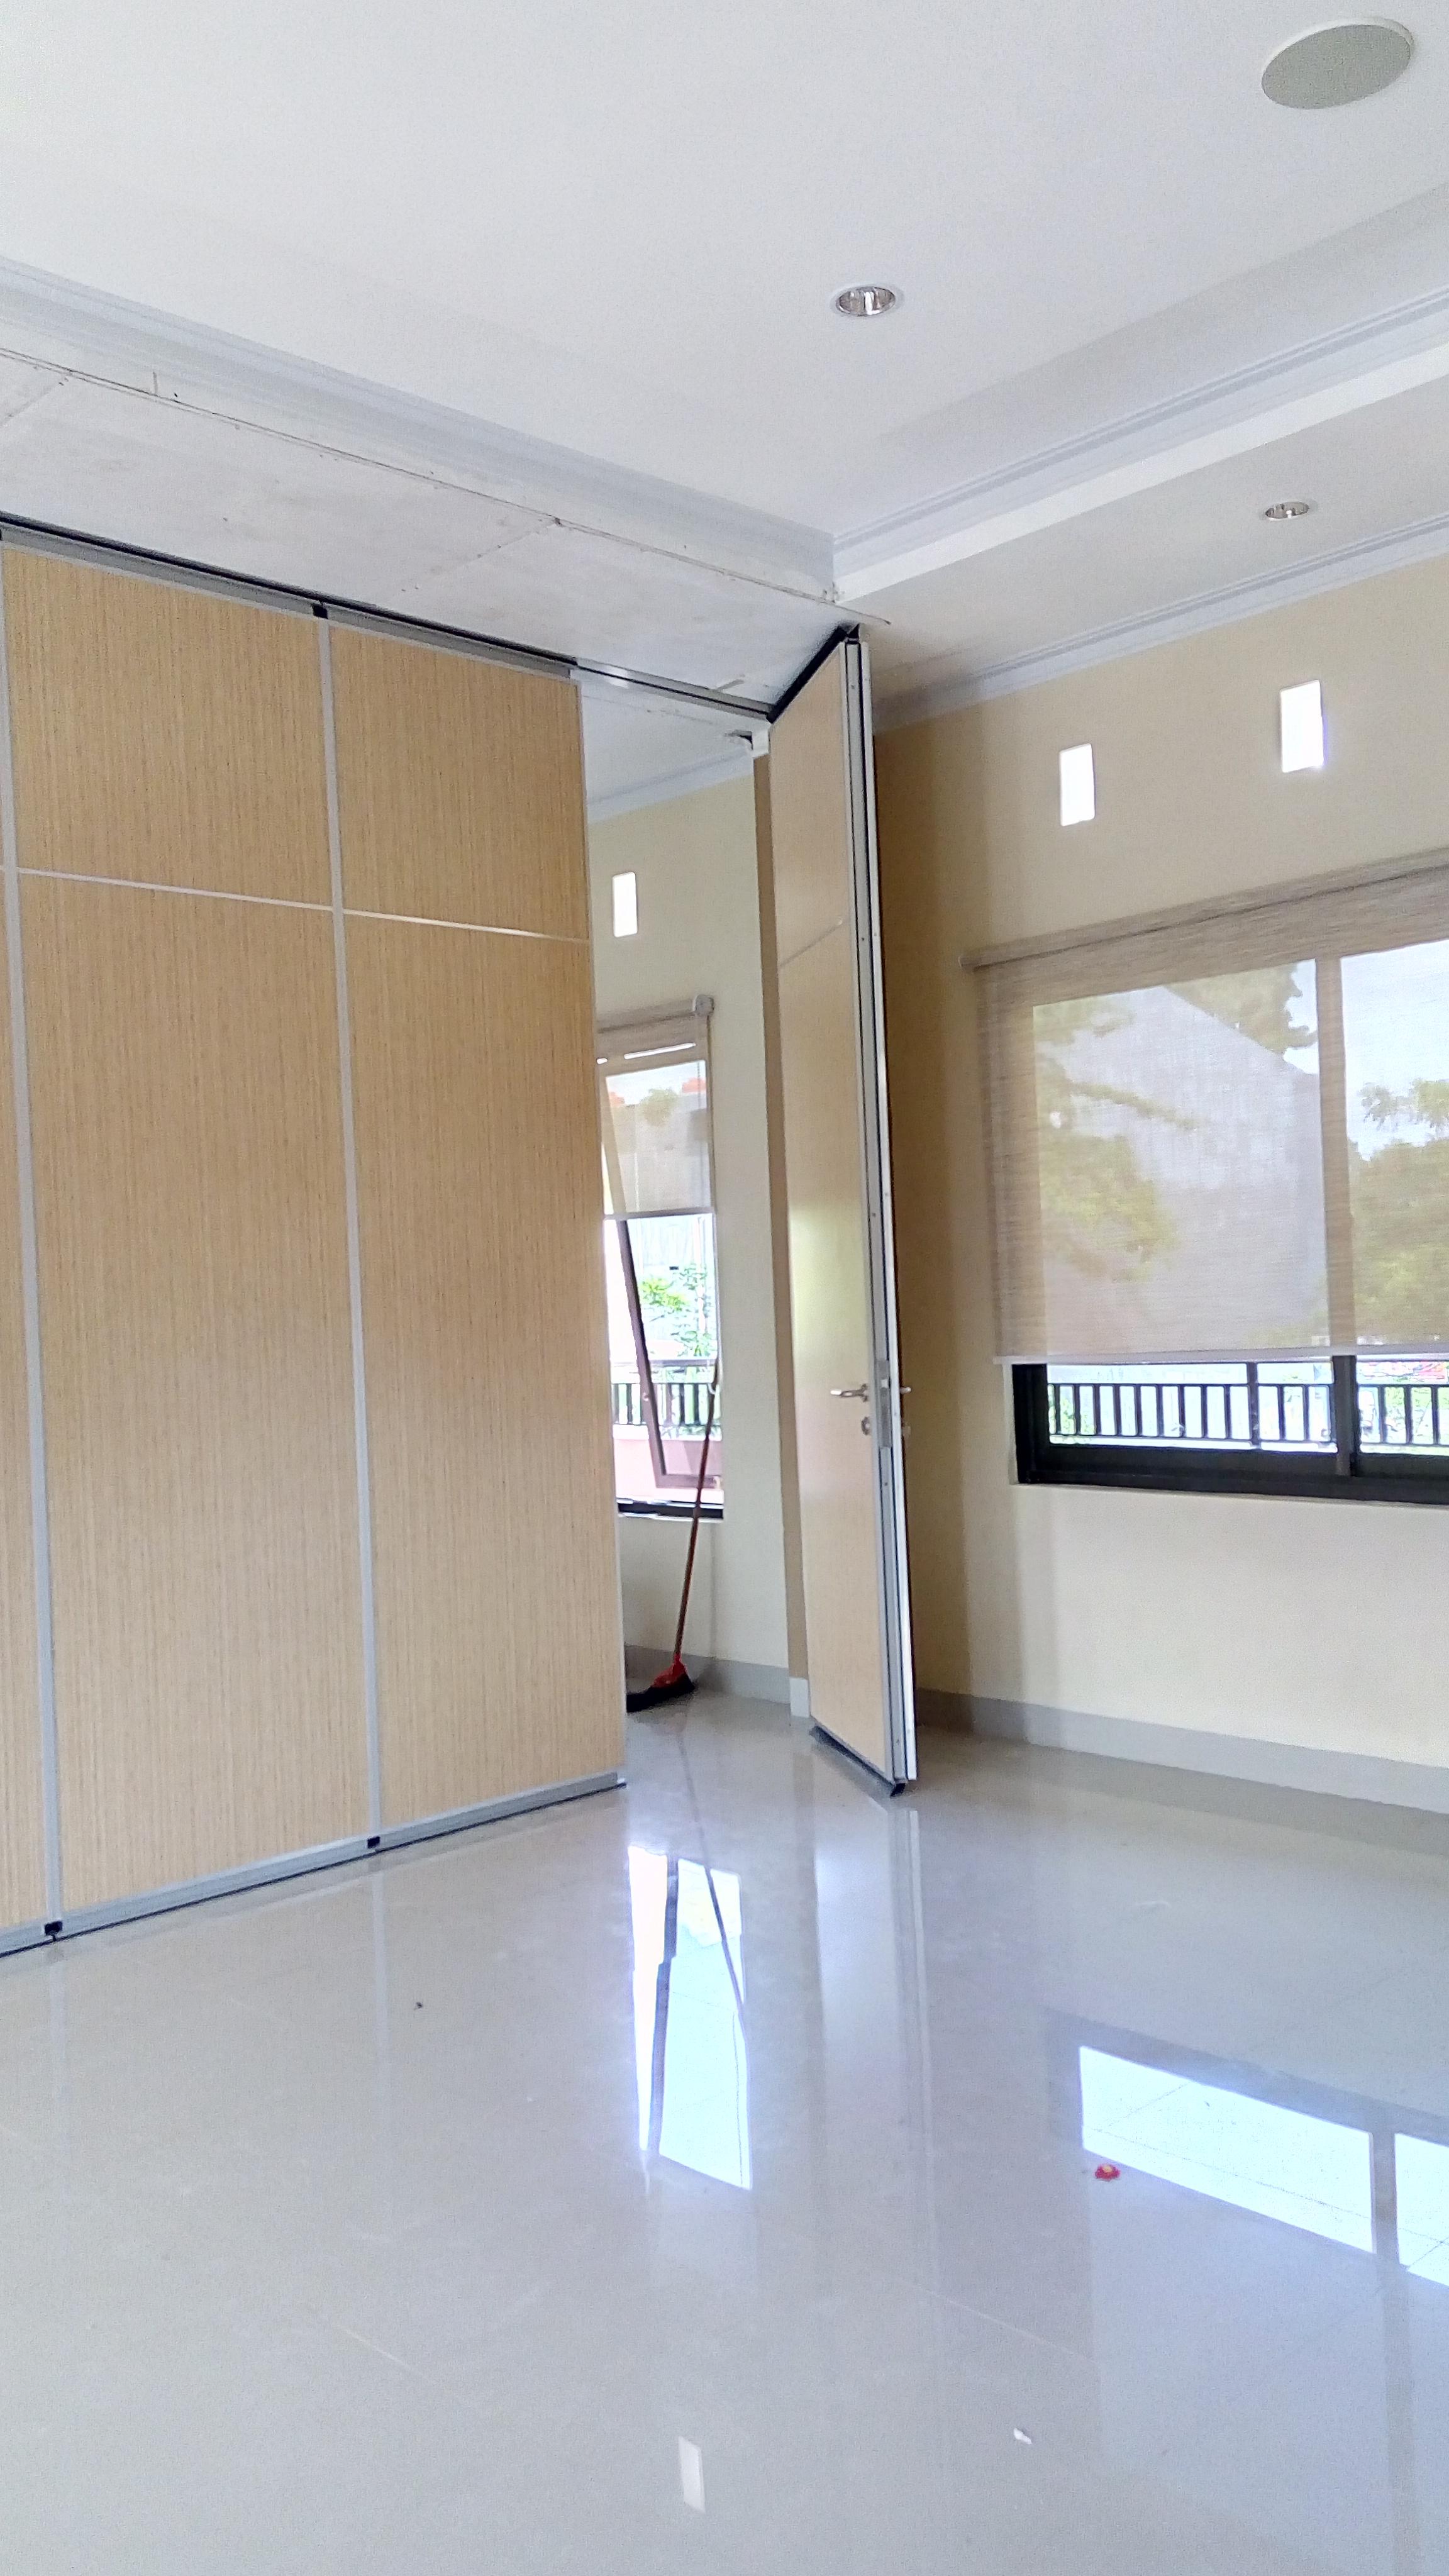 Gedung Serba Guna Wahdah Islamiah Lt.3 Makassar / Sekolah Wanita Wahdah Islamiah Makassar